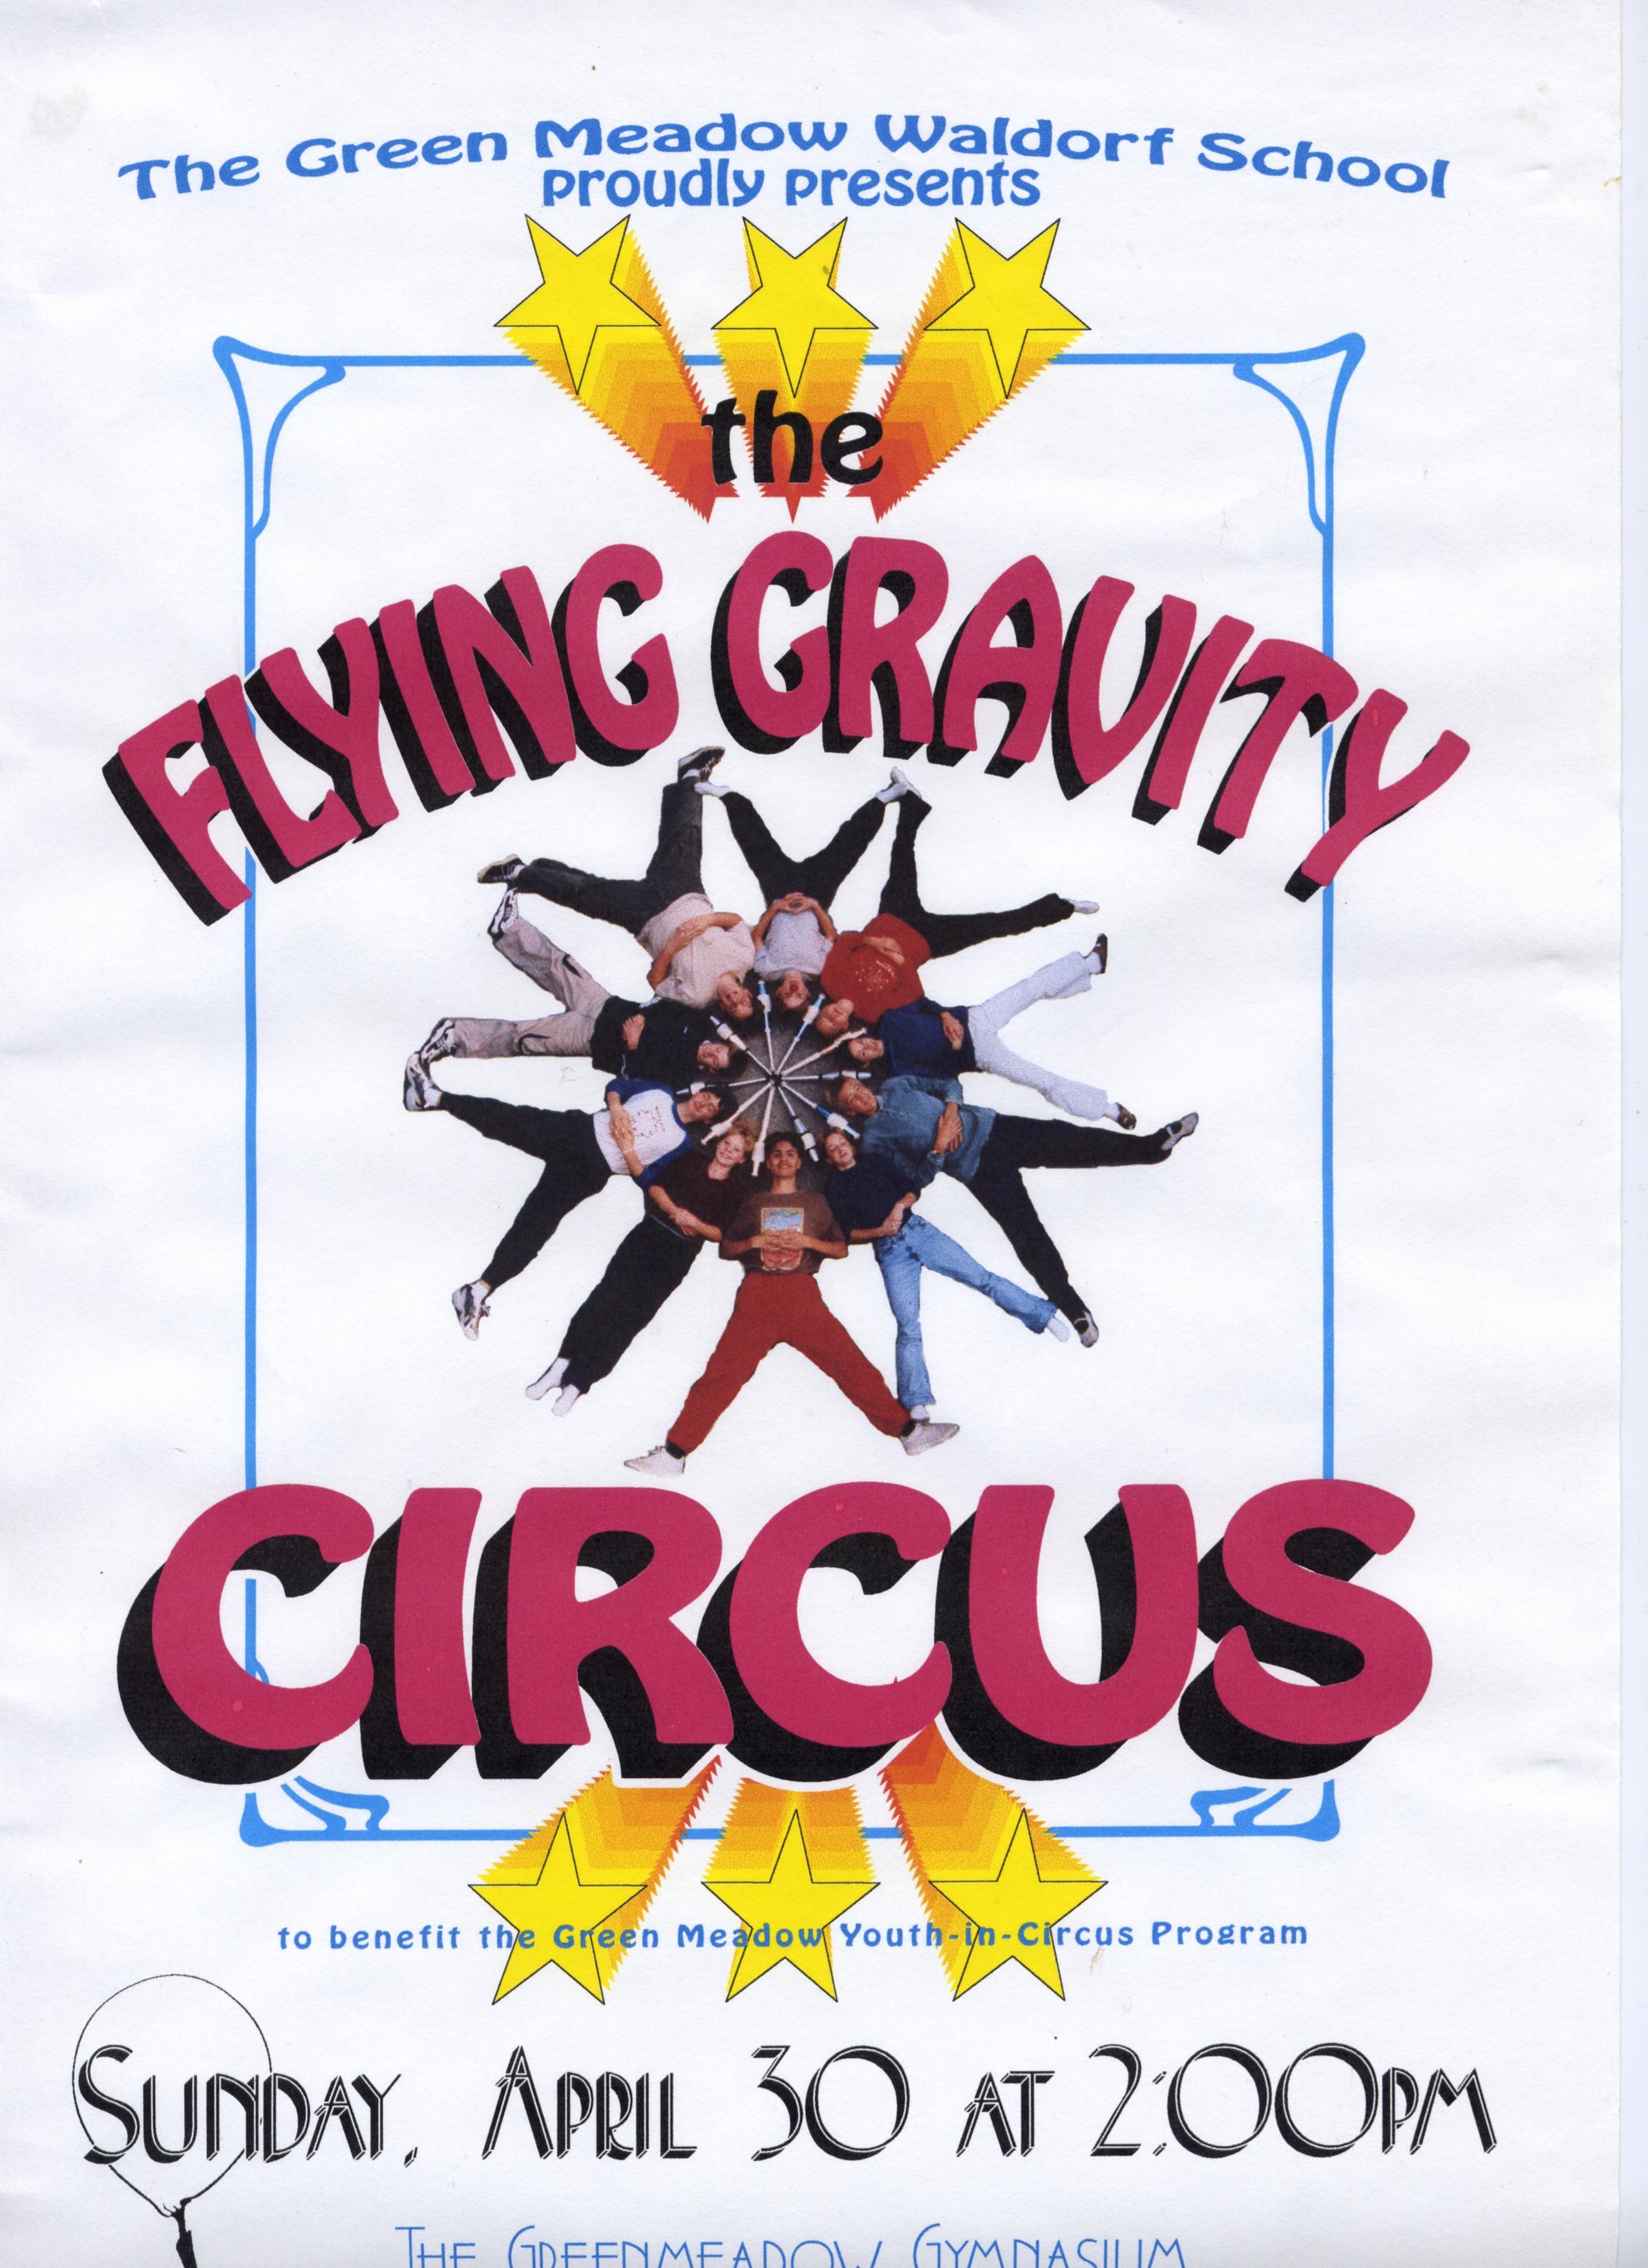 FGC Poster April 30 2000